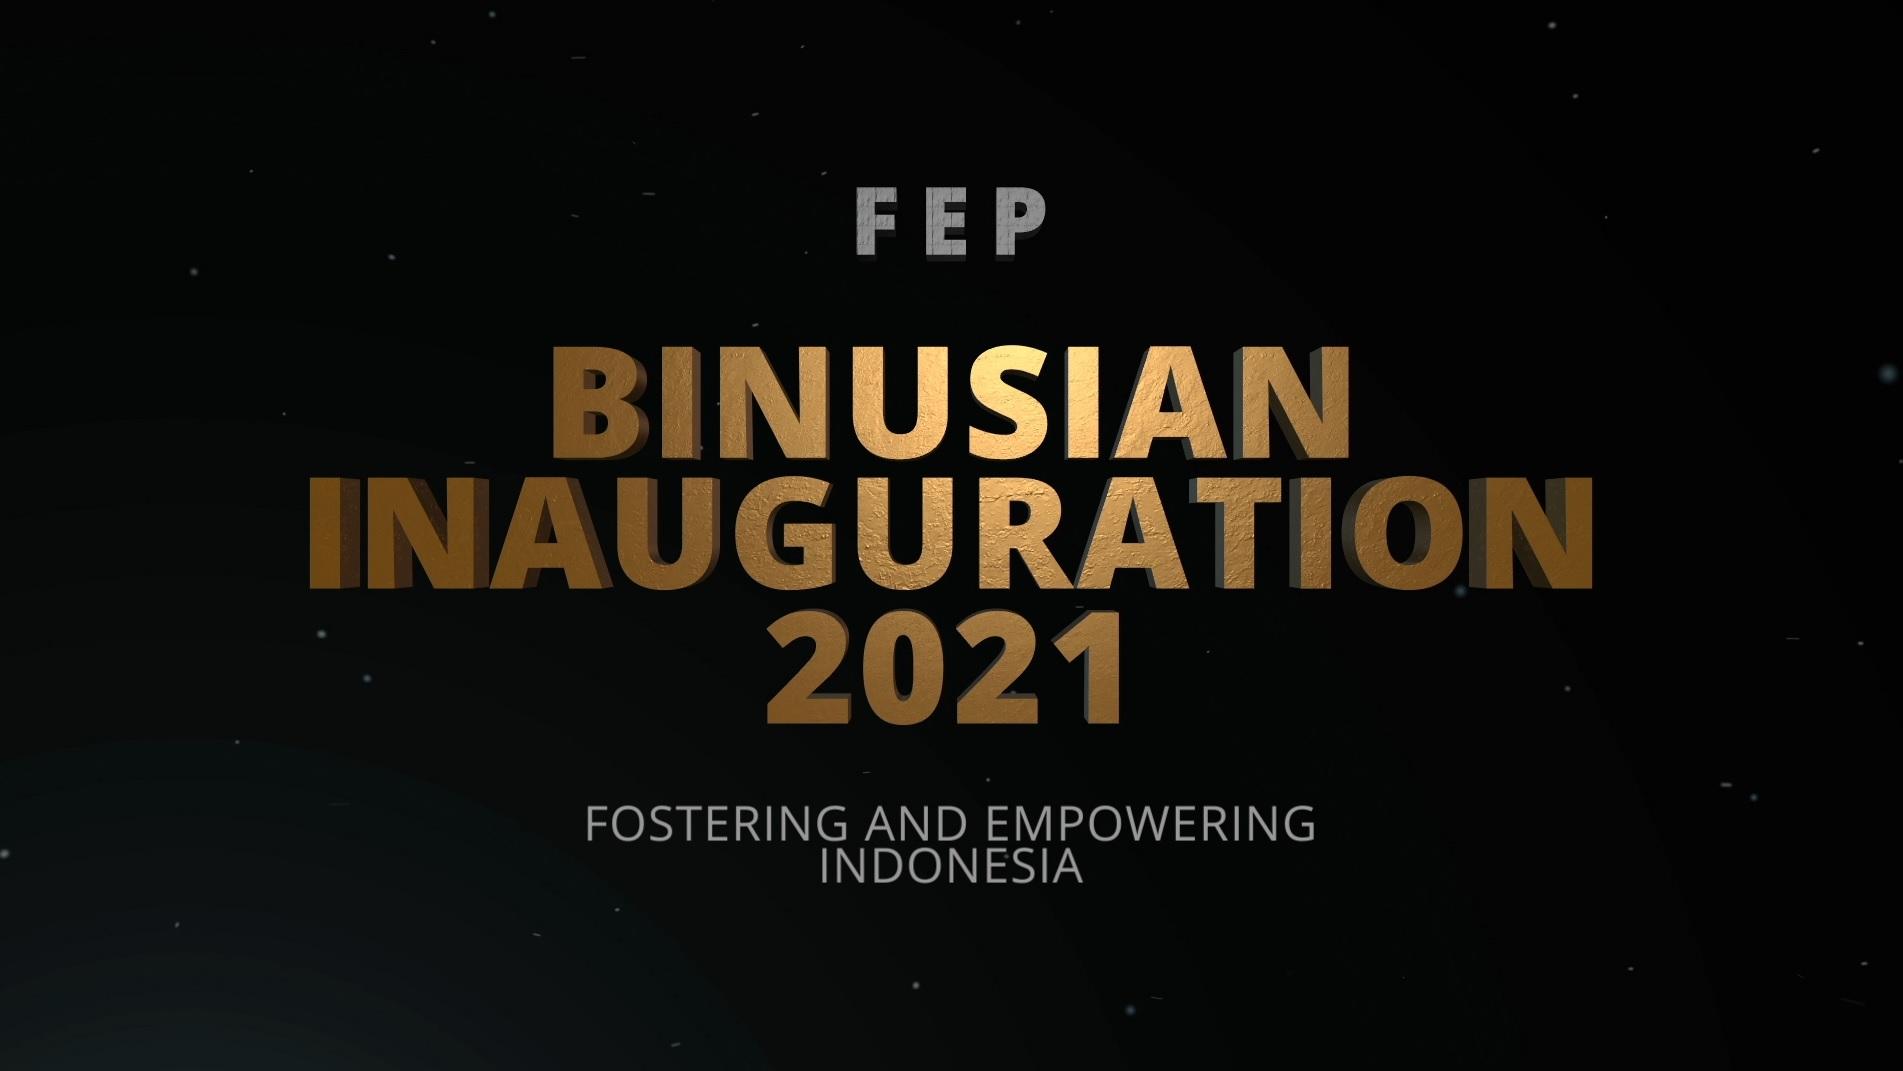 BINUSIAN INAUGURATION 2021